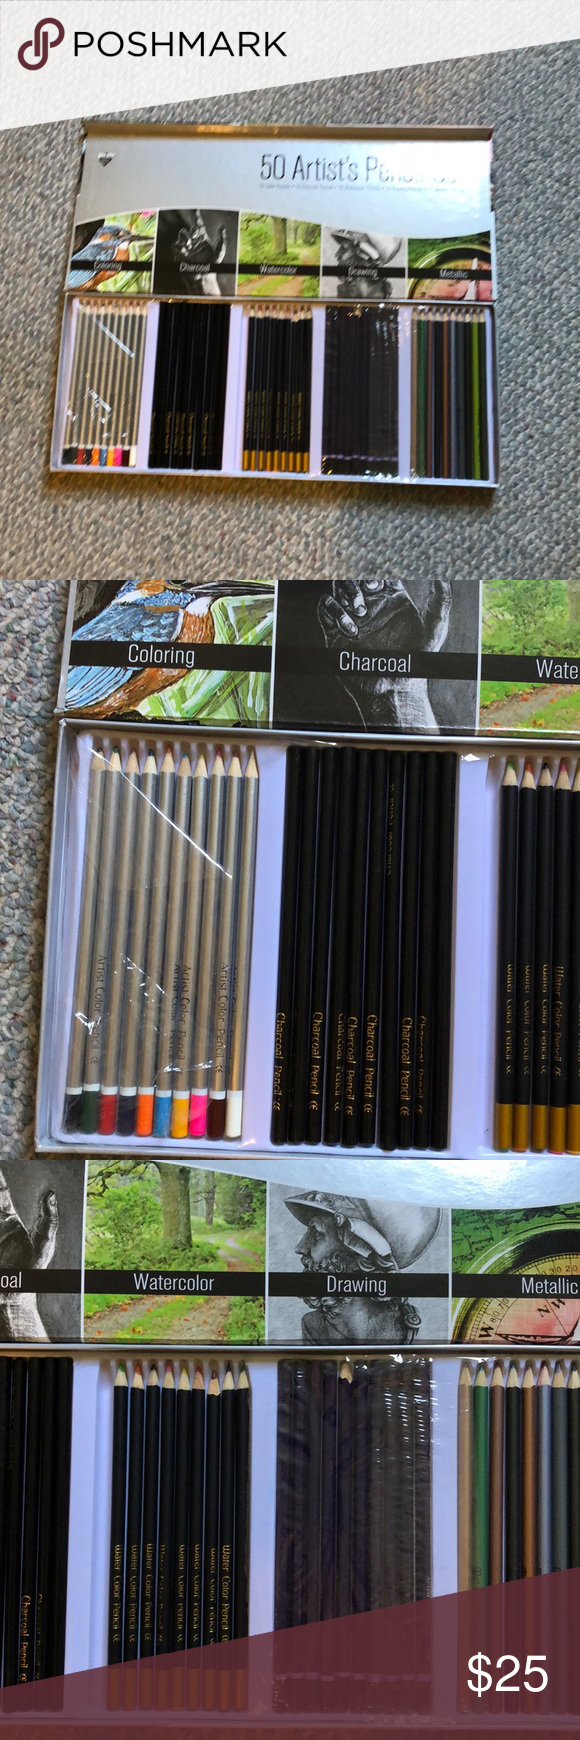 Artist pencil set charcoal, watercolor, drawing Artist